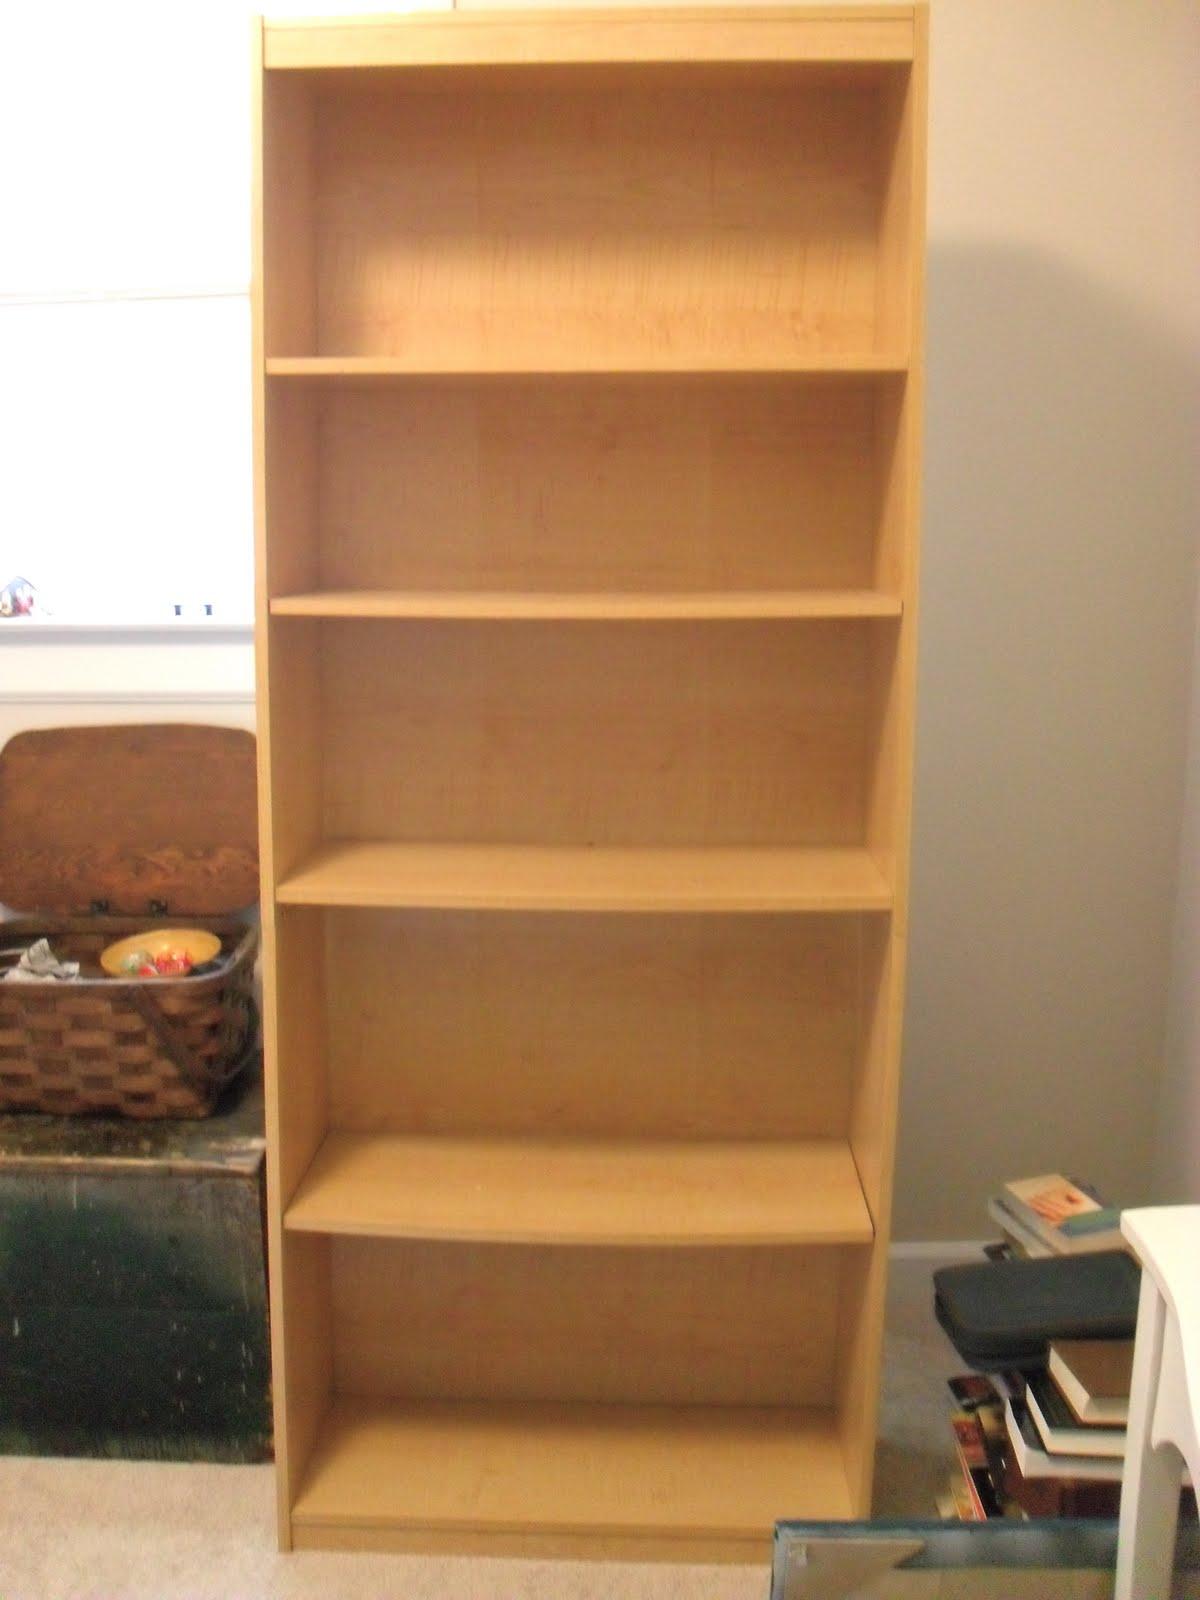 painting laminate furnitureThe Remodeled Life HowTo Paint Laminate Furniture Part One